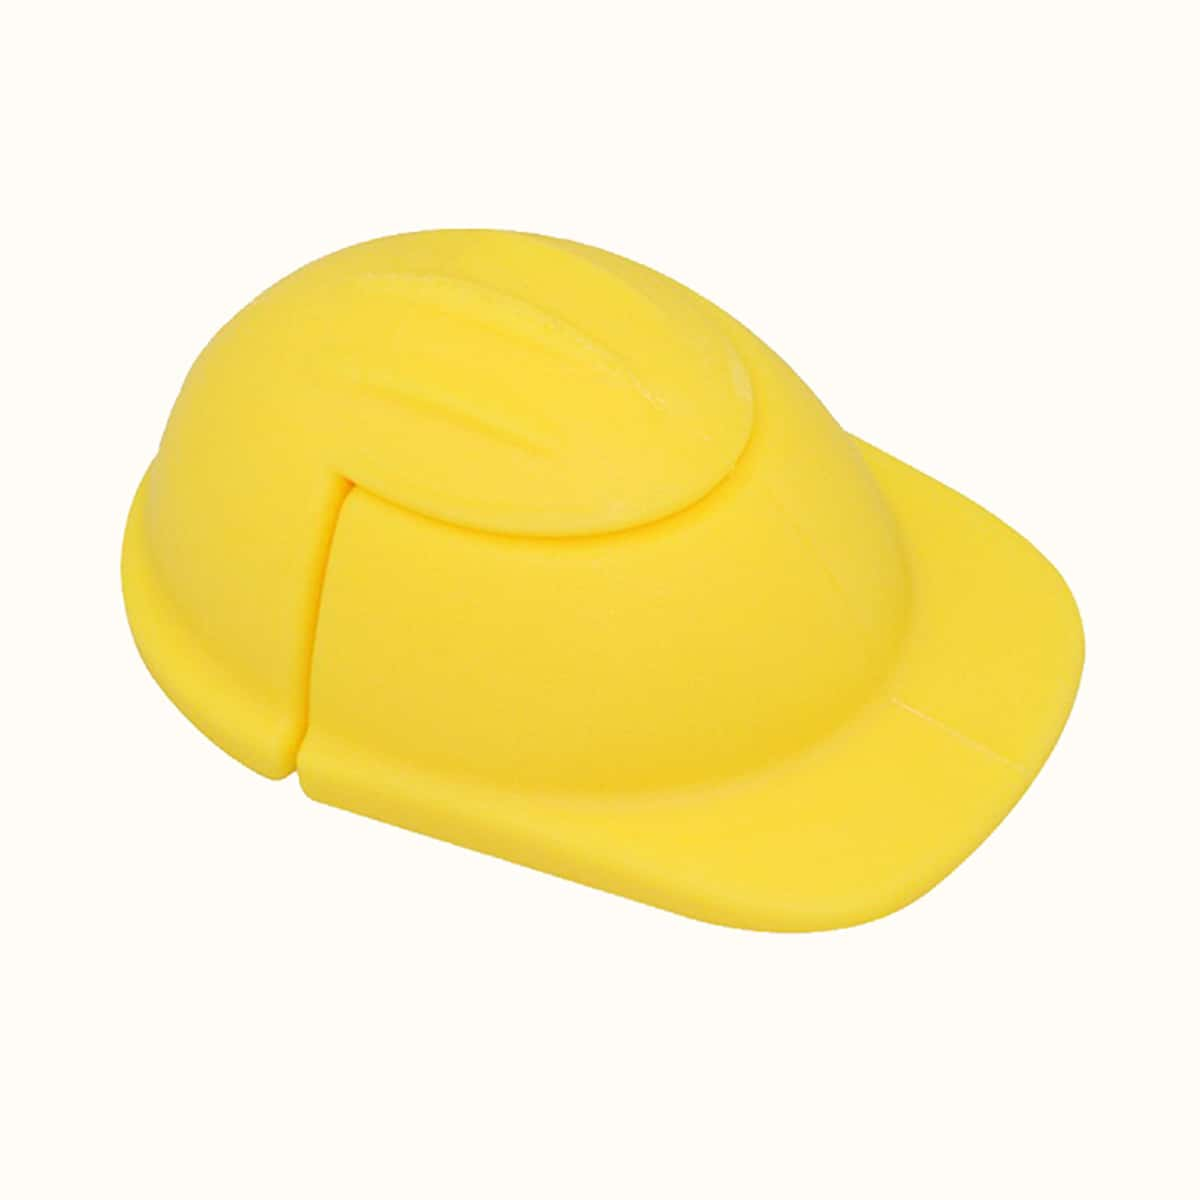 Safety Helmet Shaped USB Flash Drive